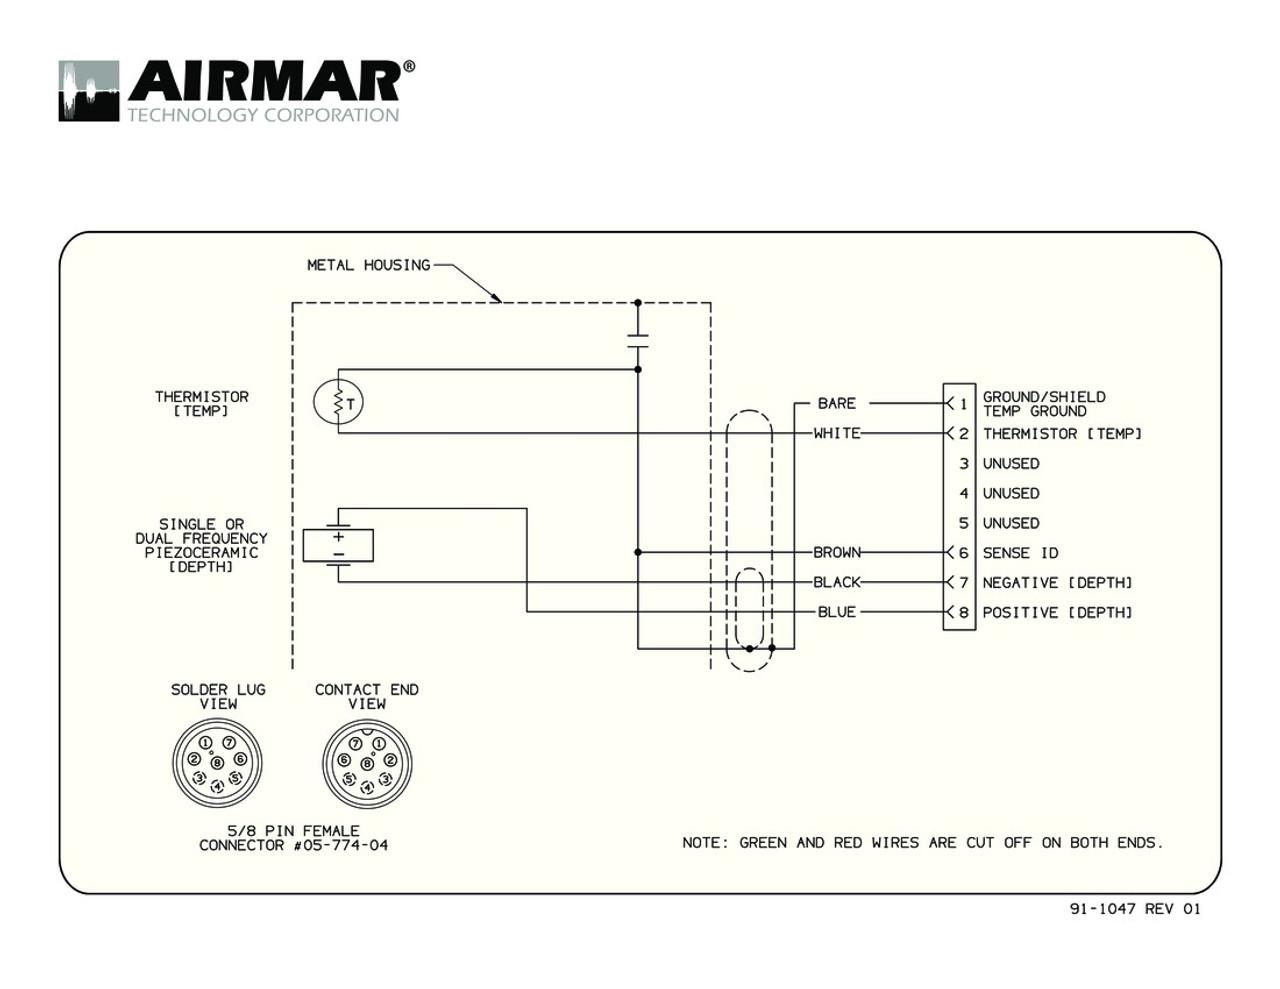 small resolution of garmin radar wiring diagram wiring librarydepth u0026 temperature b117 transducers with garmin 8 pin connector